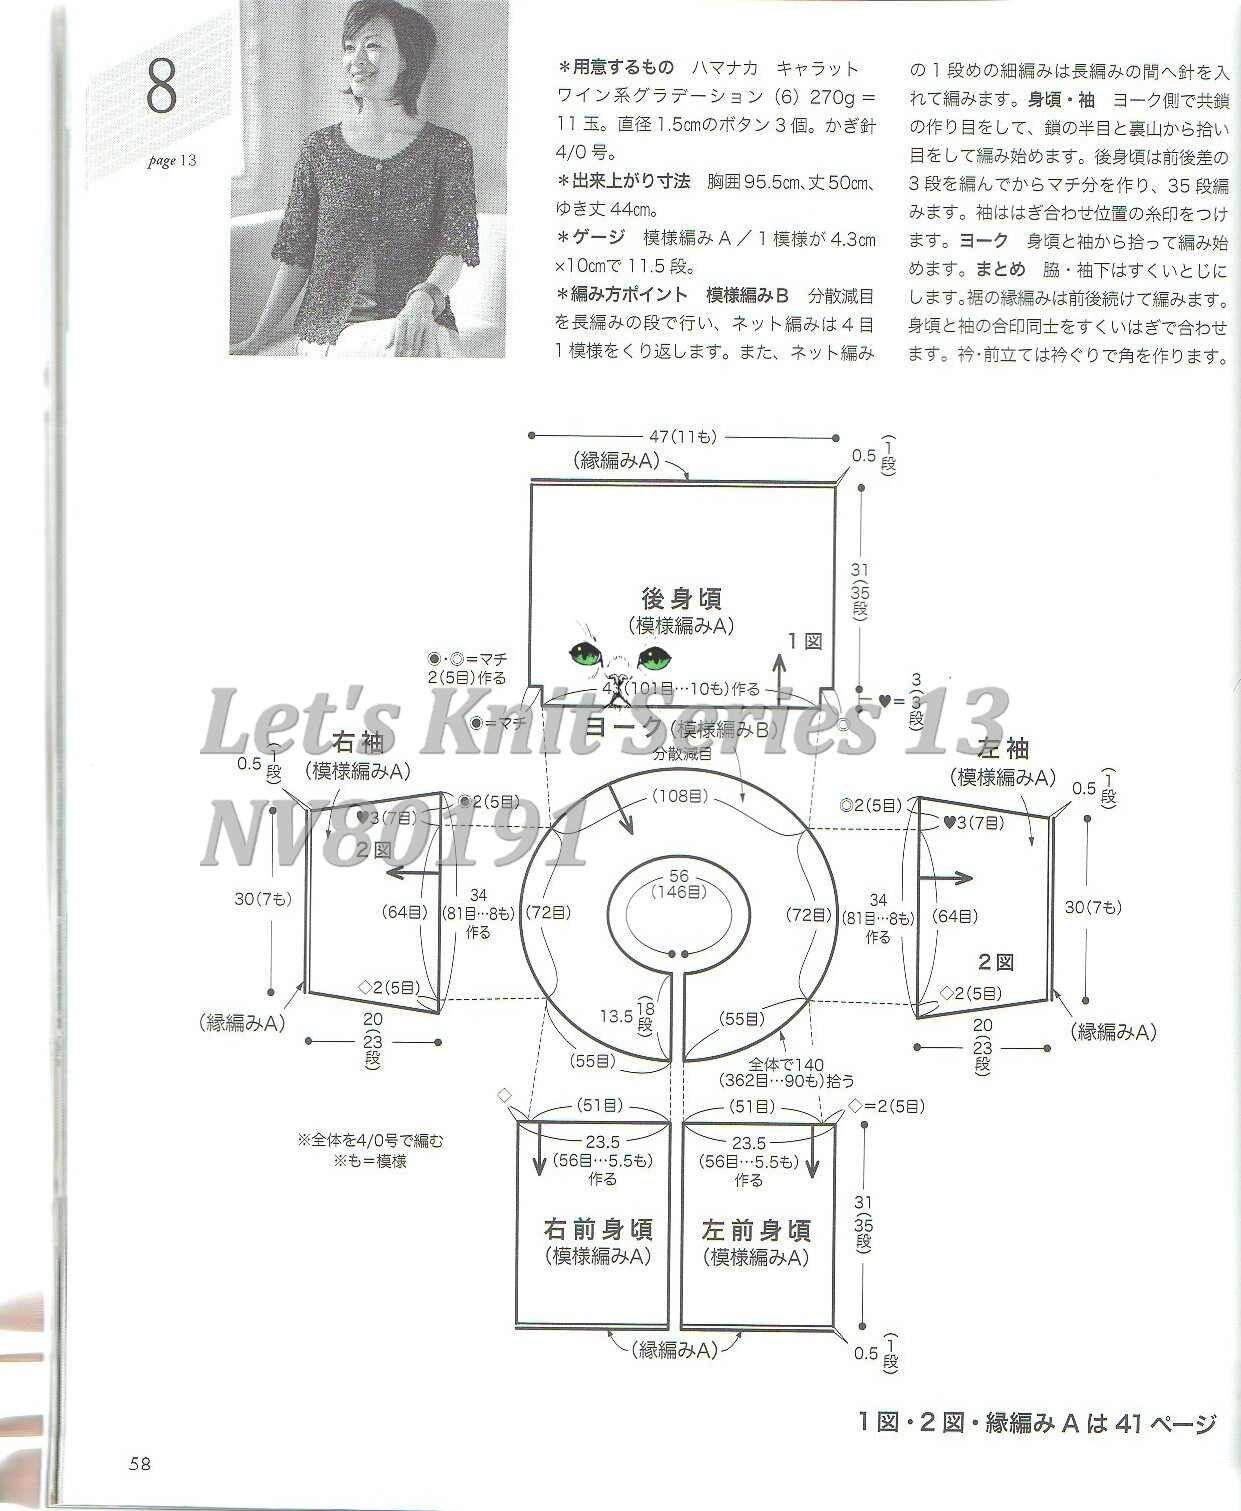 Let\'s Knit Series 13 NV80191059.jpg